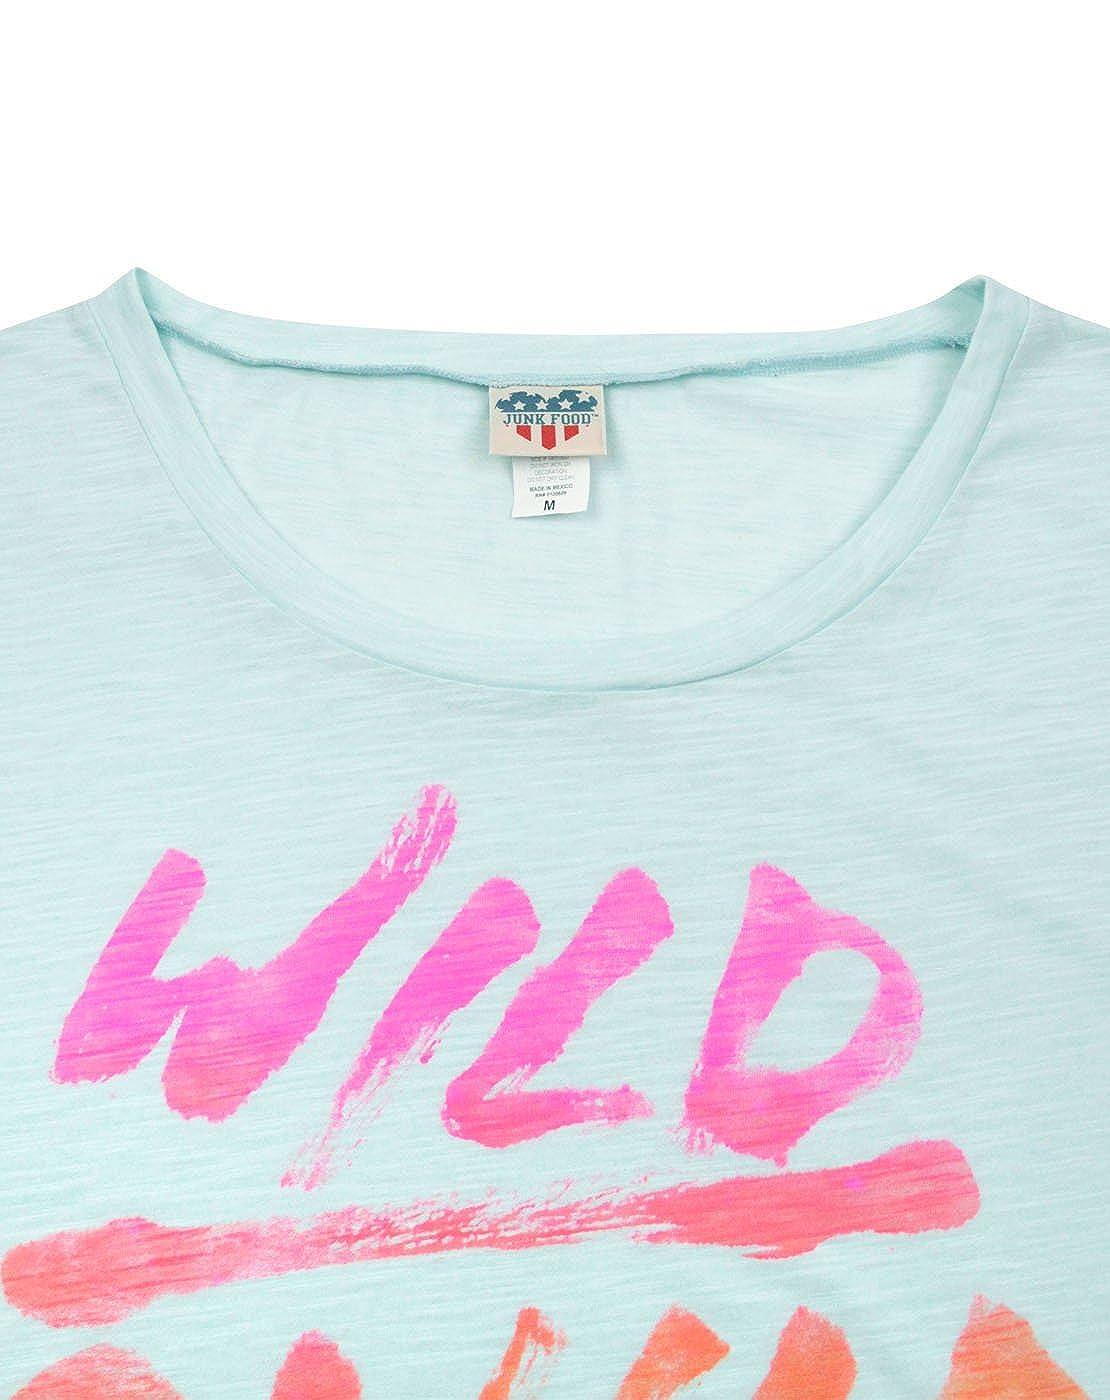 Amazon.com: Comida chatarra Wild Child – playera para mujer ...